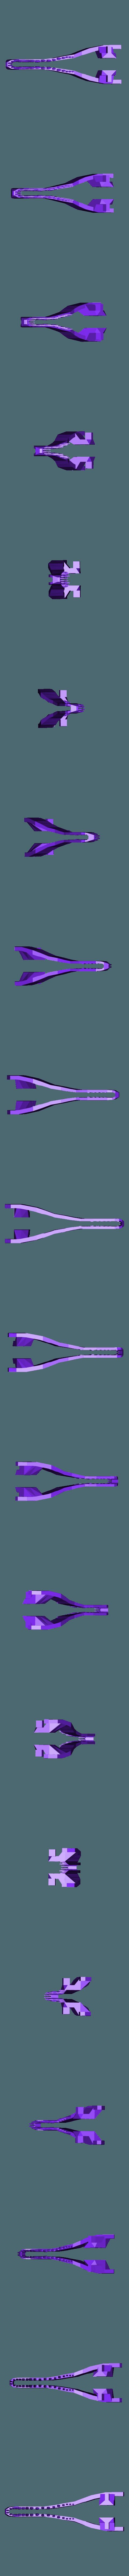 bas dino.stl Download free STL file dinosaur skull • 3D printer object, grogro